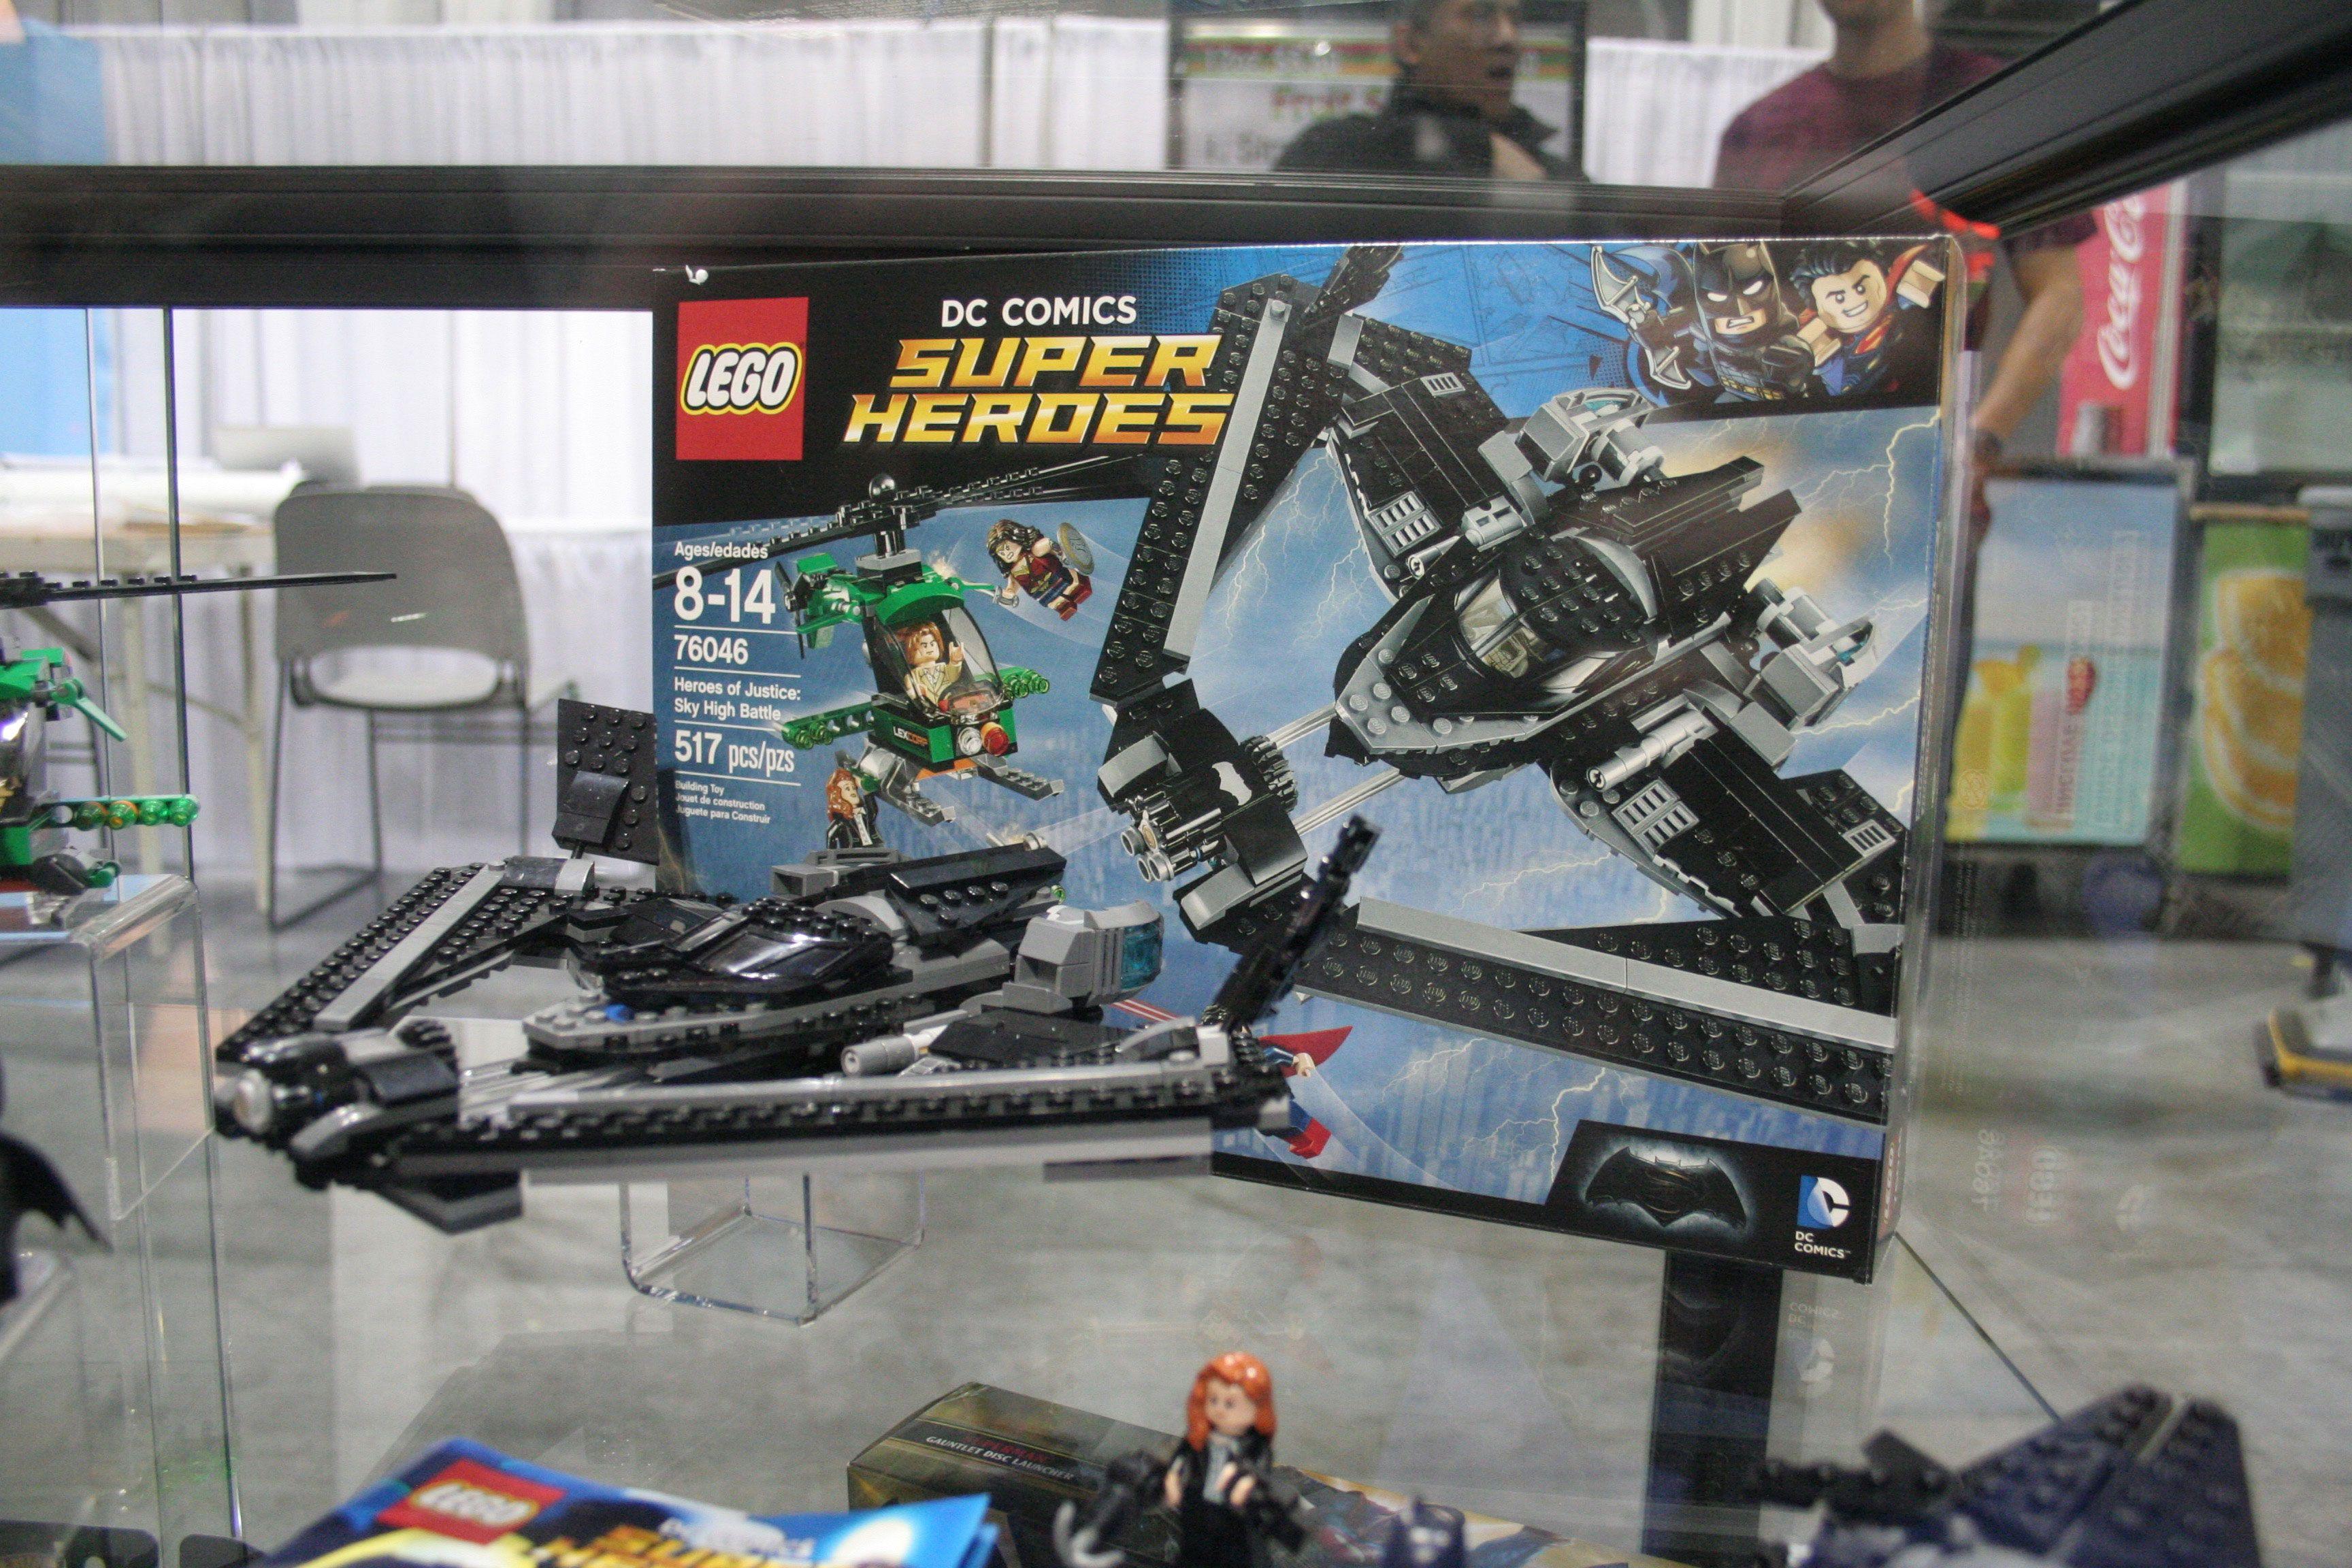 Batman vs Superman Toy Lines Unveiled at Toy Fair | Collider